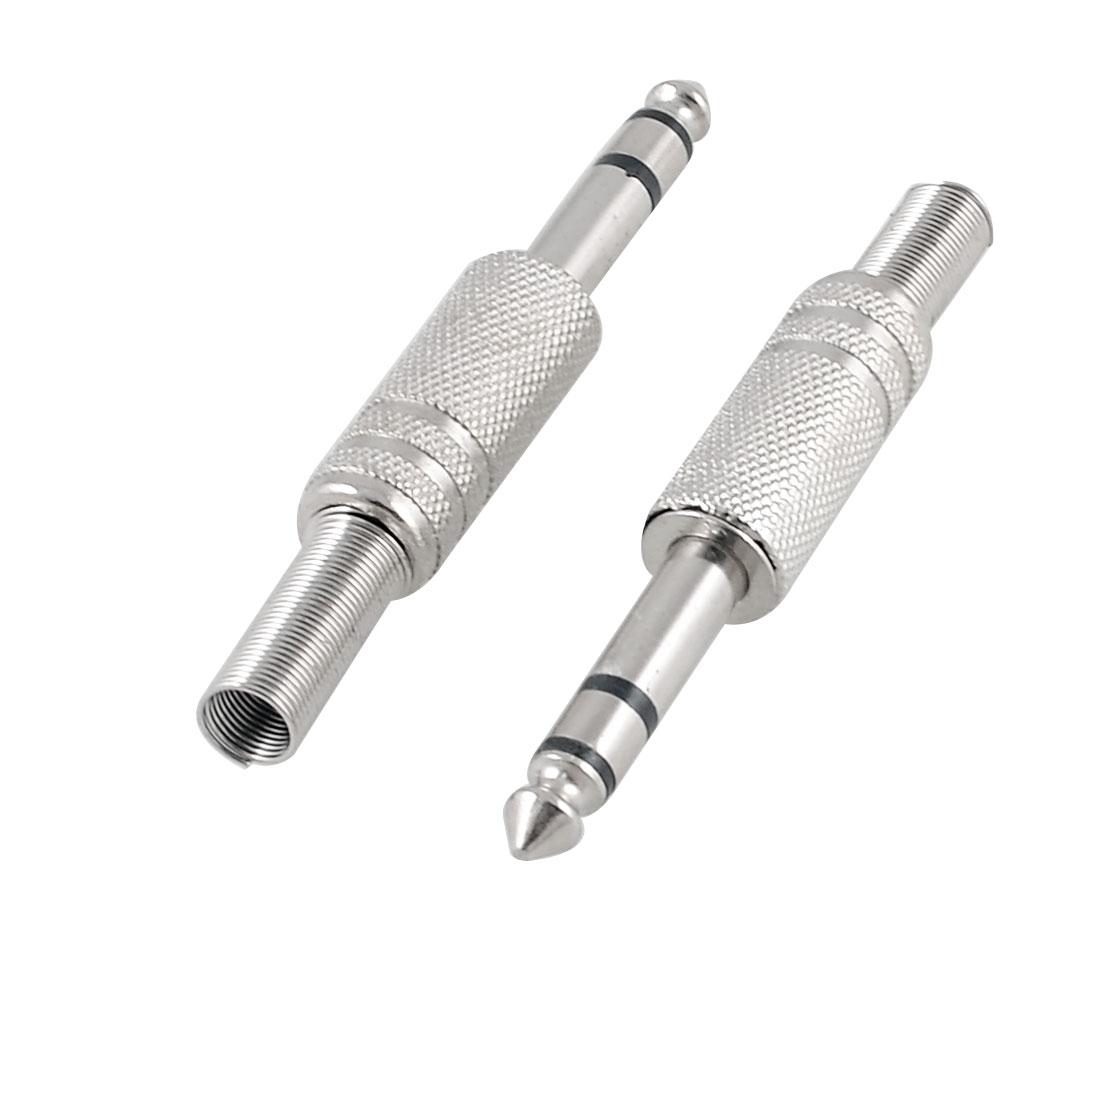 5 Pcs 6.35mm Mono Plug DIY Audio Adapter Connector Metal Spring